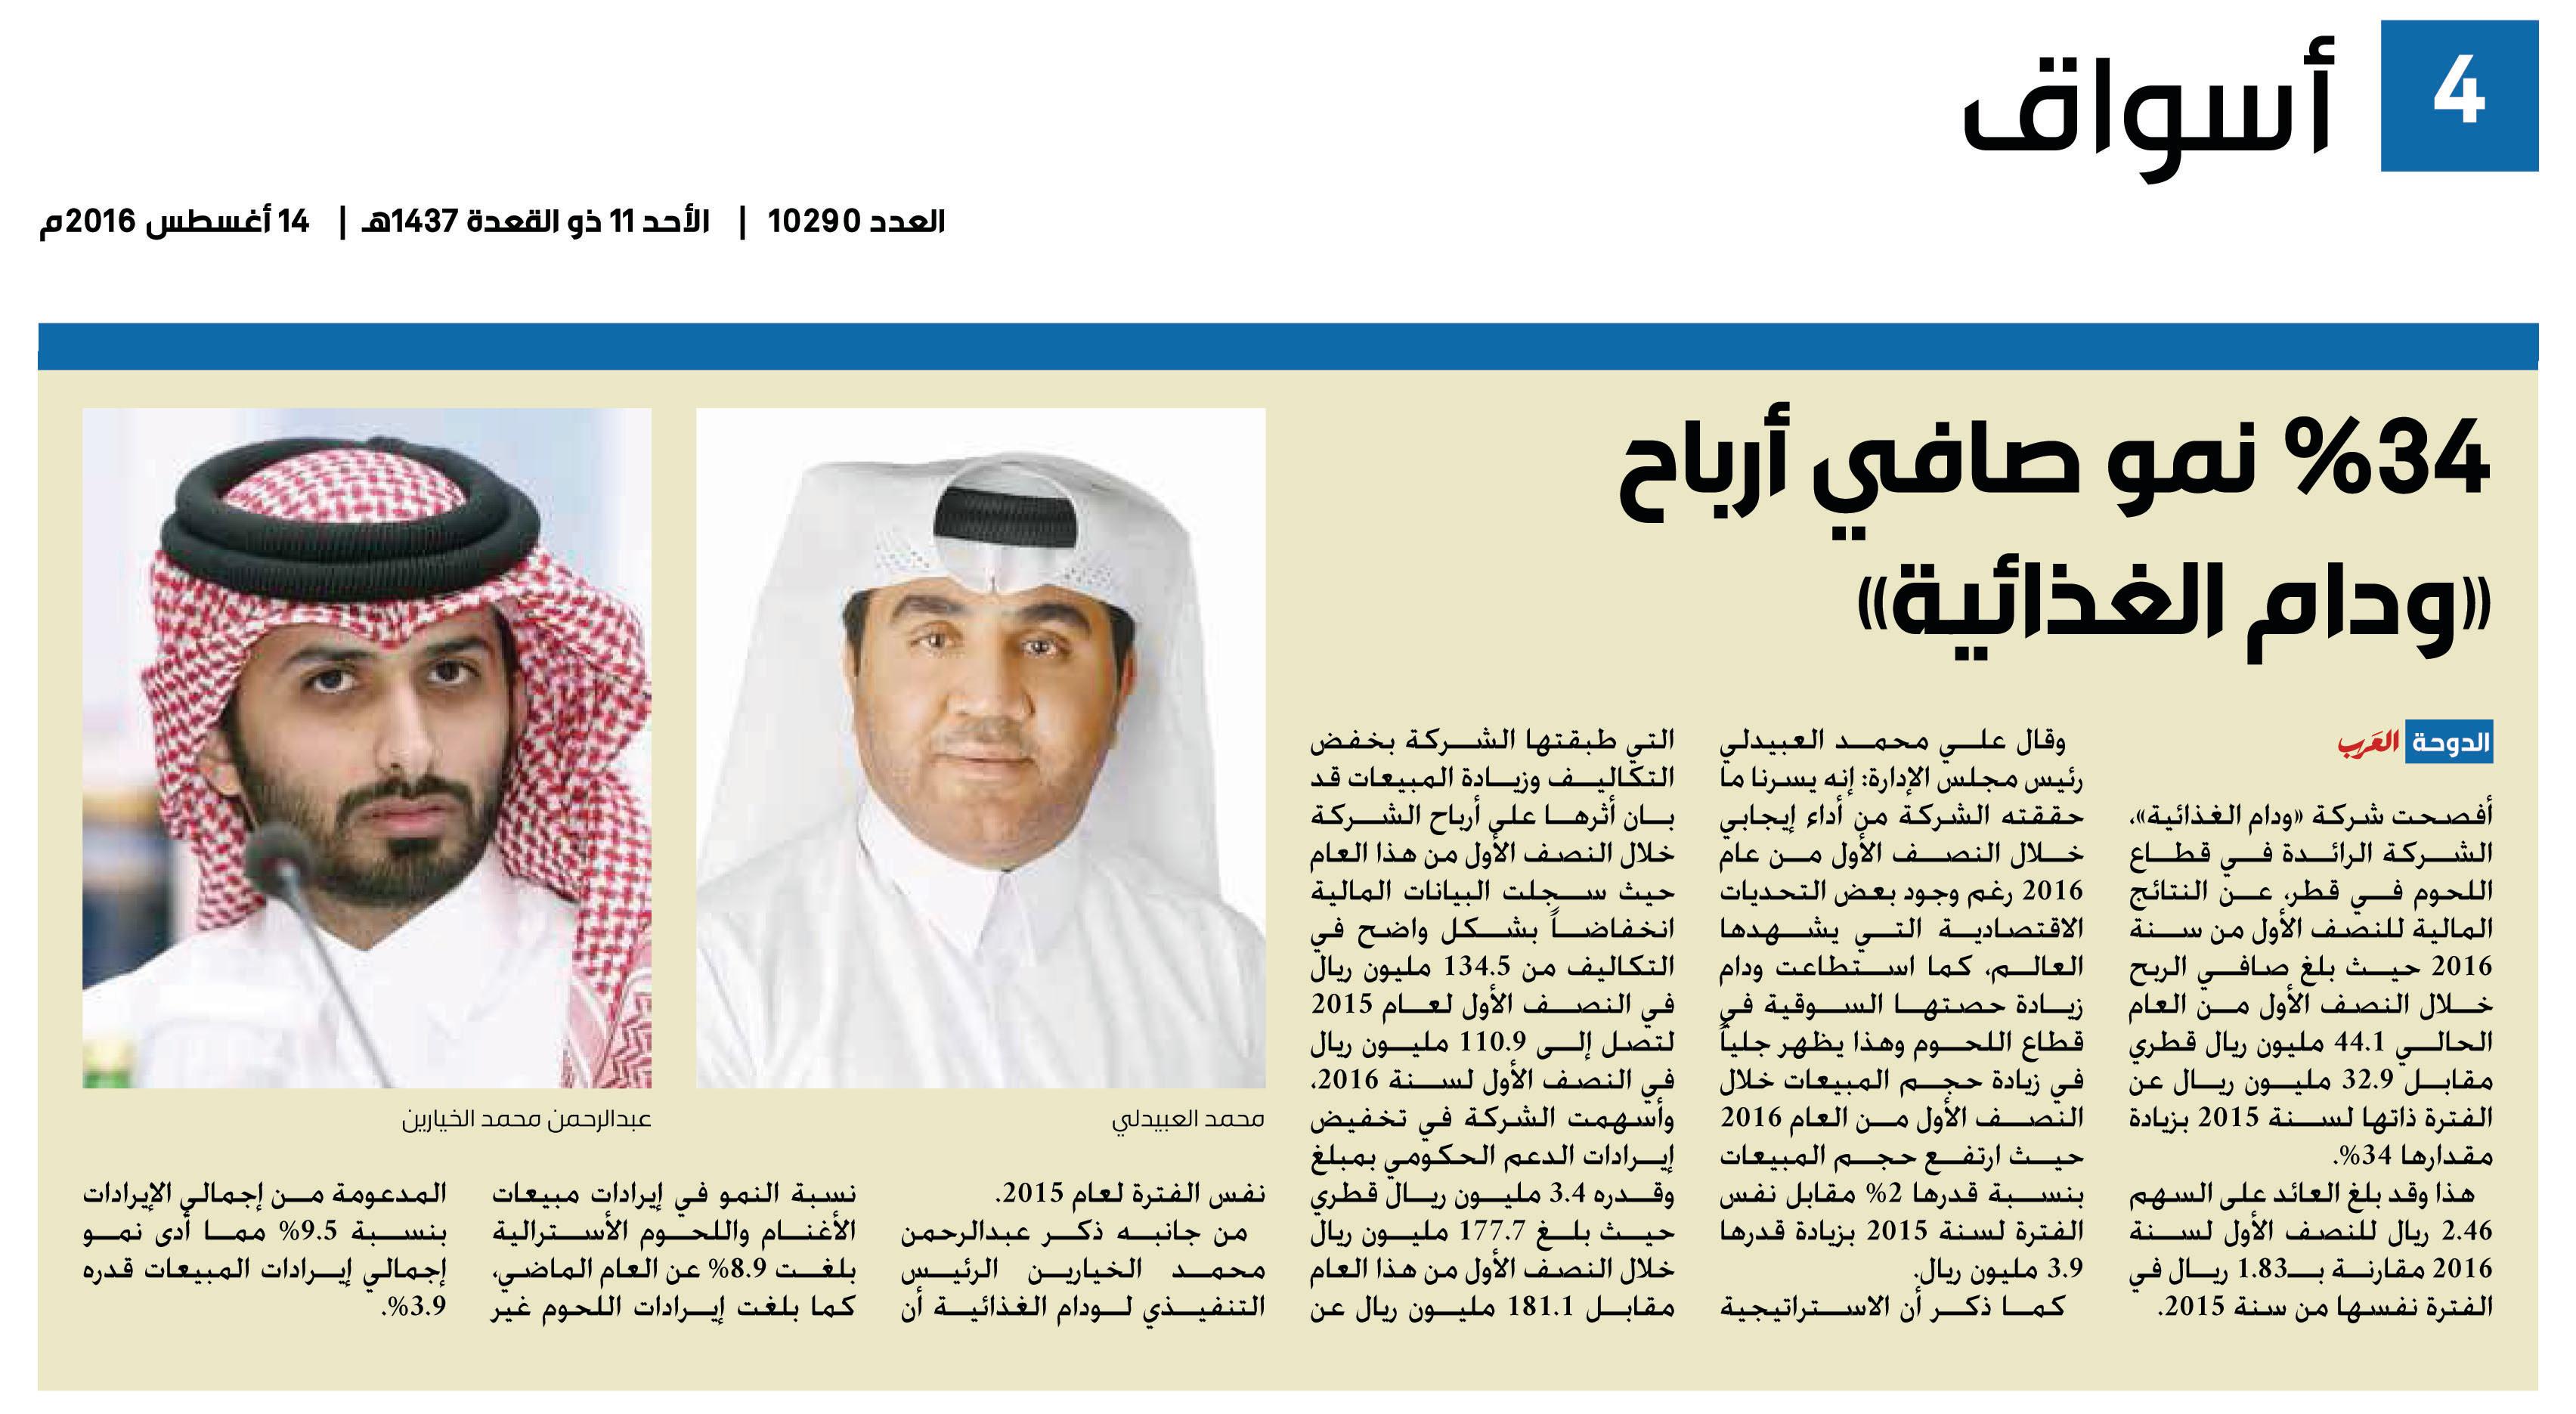 Arab_14-8-2016.jpg